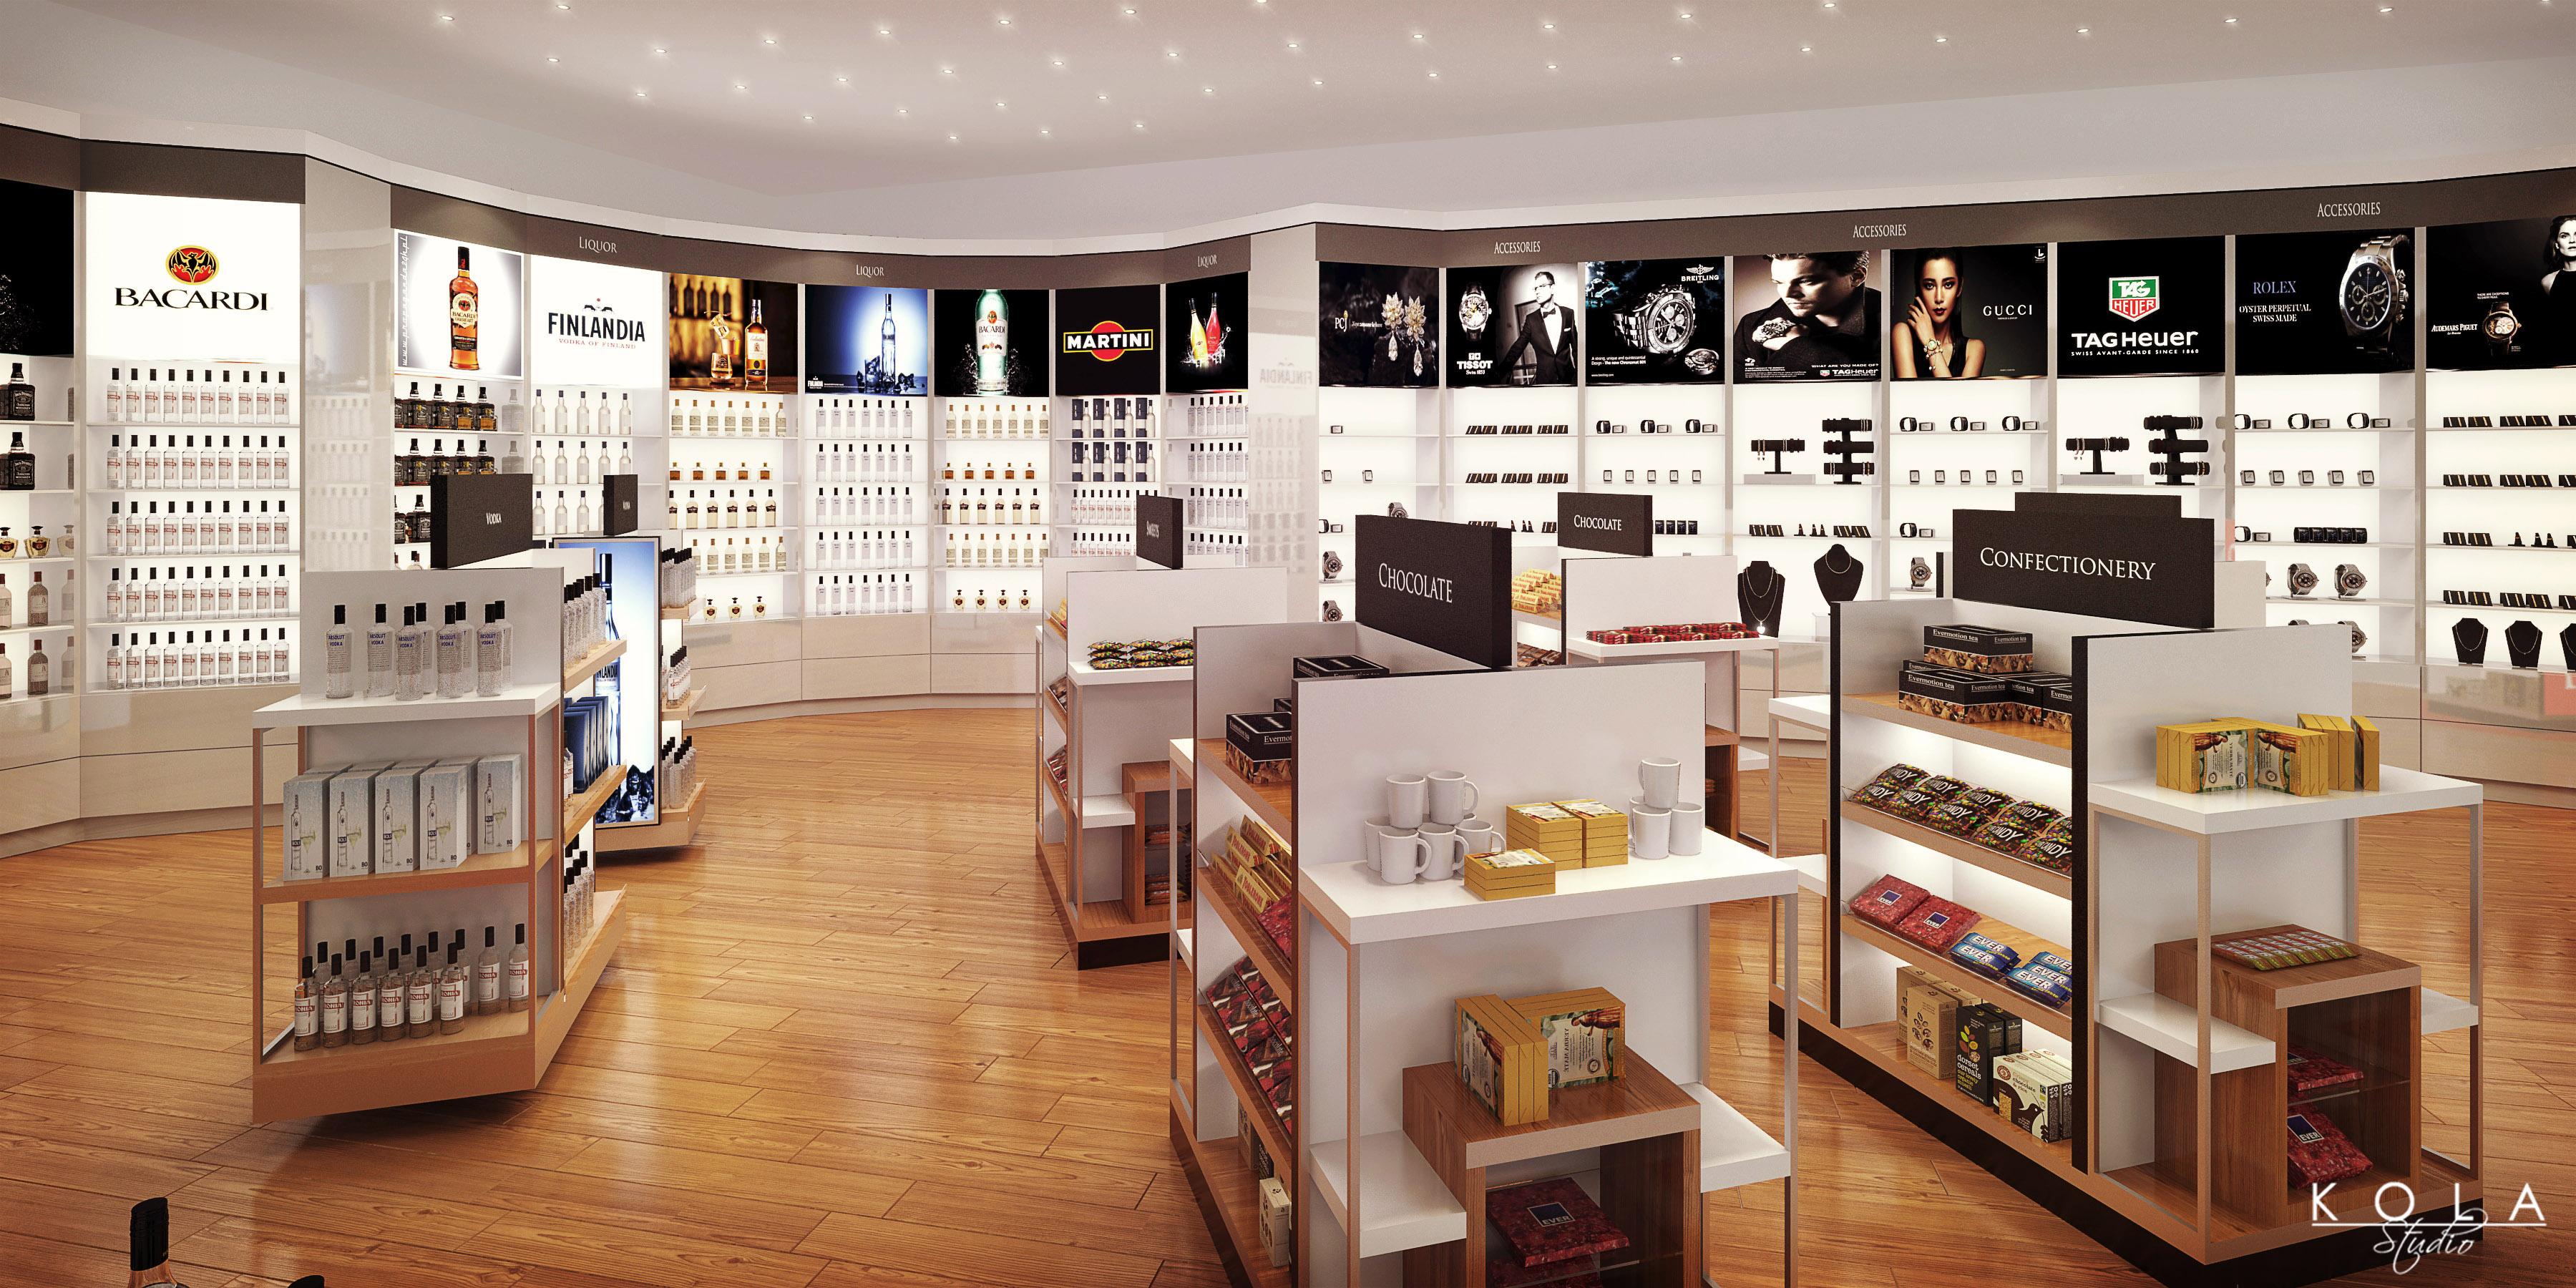 Duty Free Shop Kola Studio Architectural Visualizations